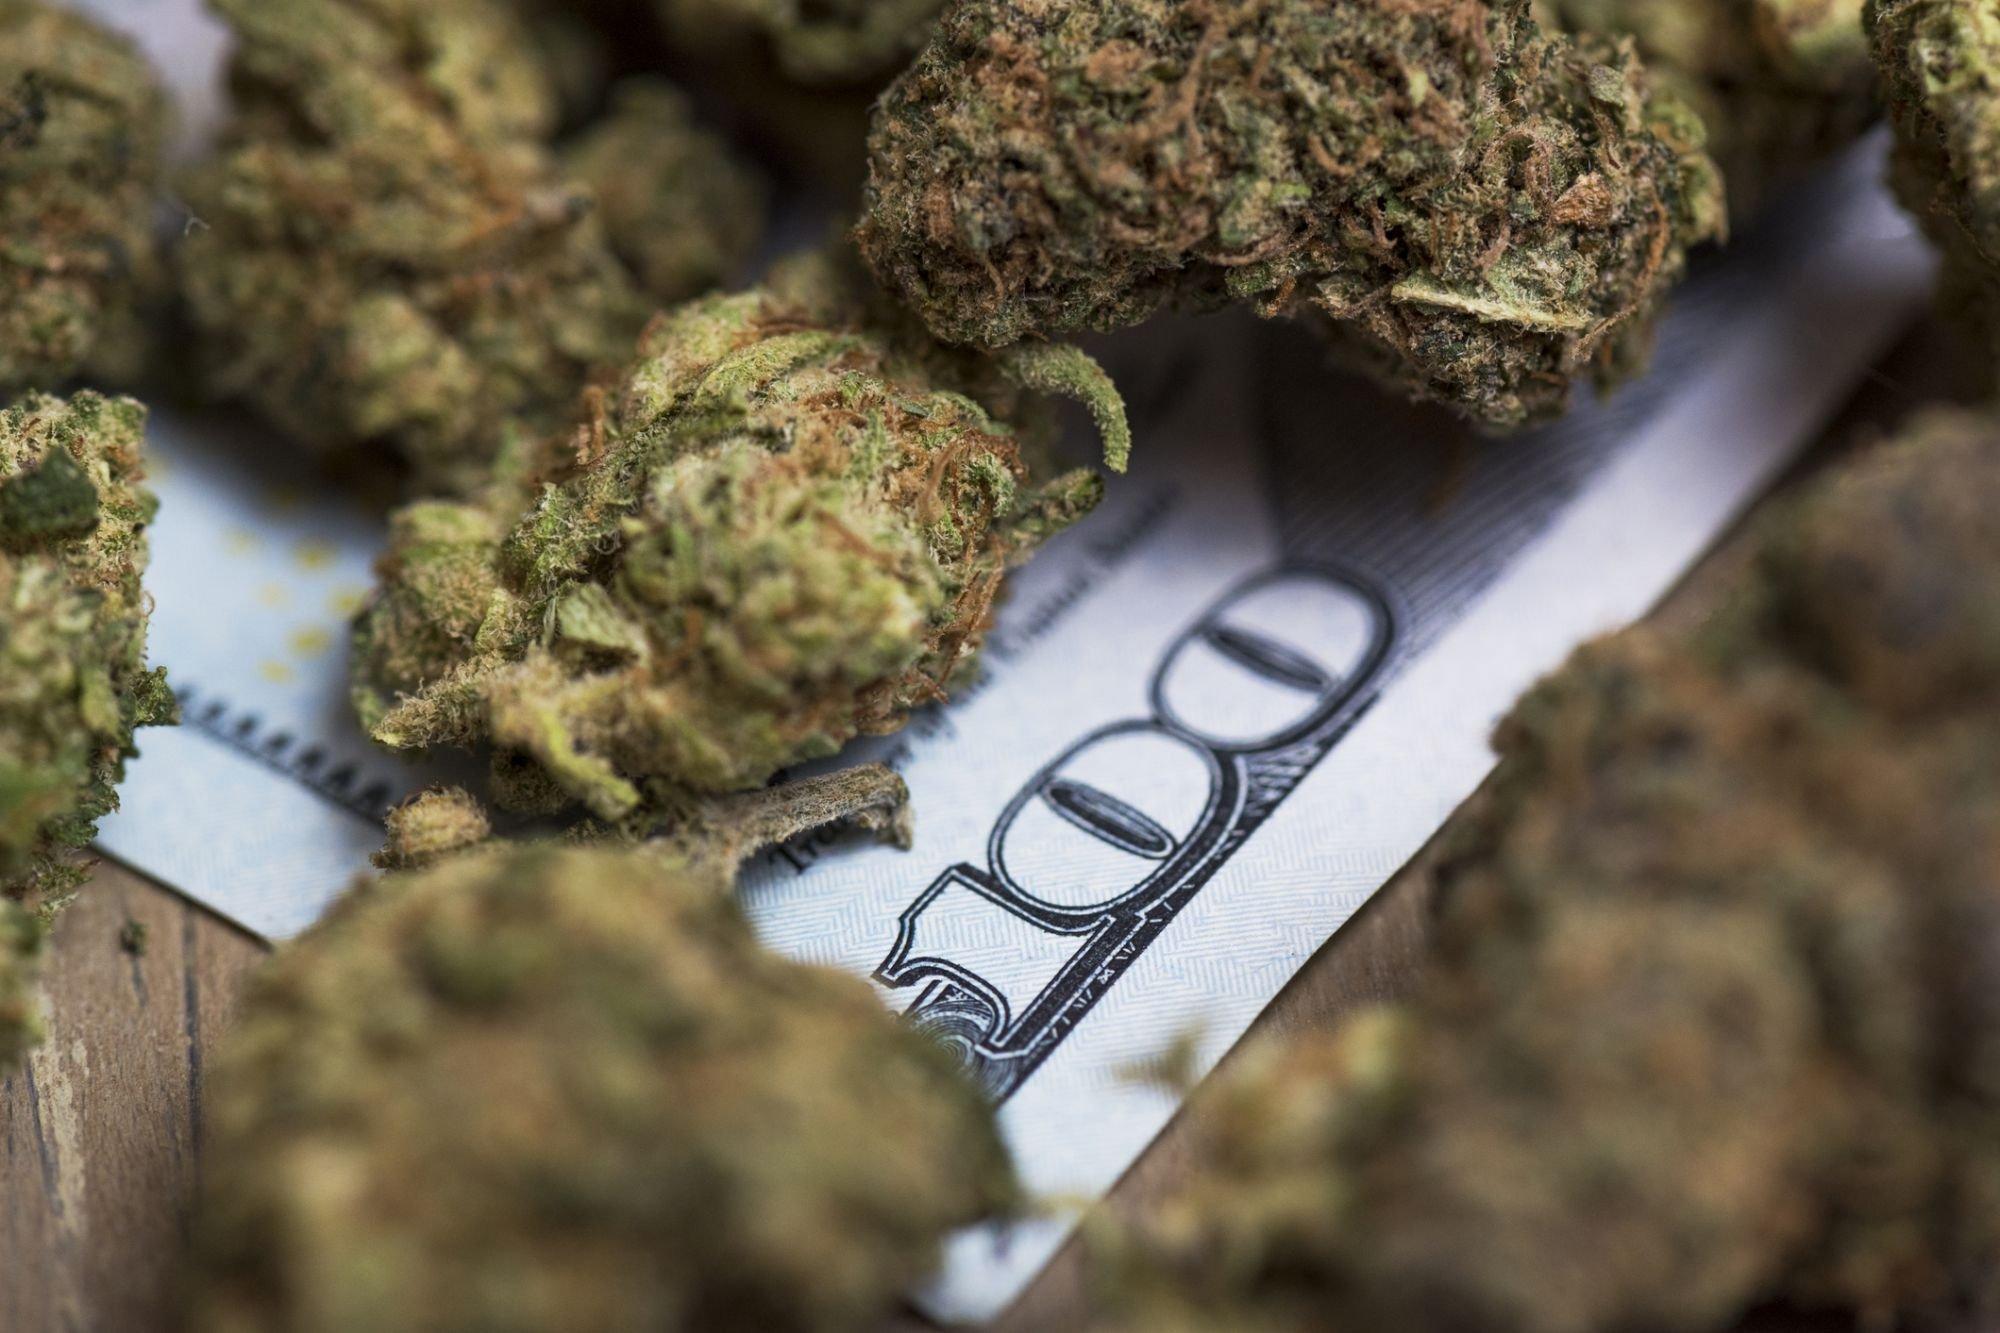 Nevada Rakes in $525 Million in Marijuana-Derived Taxes; Sales Generate Almost $1 Billion in Economic Benefits